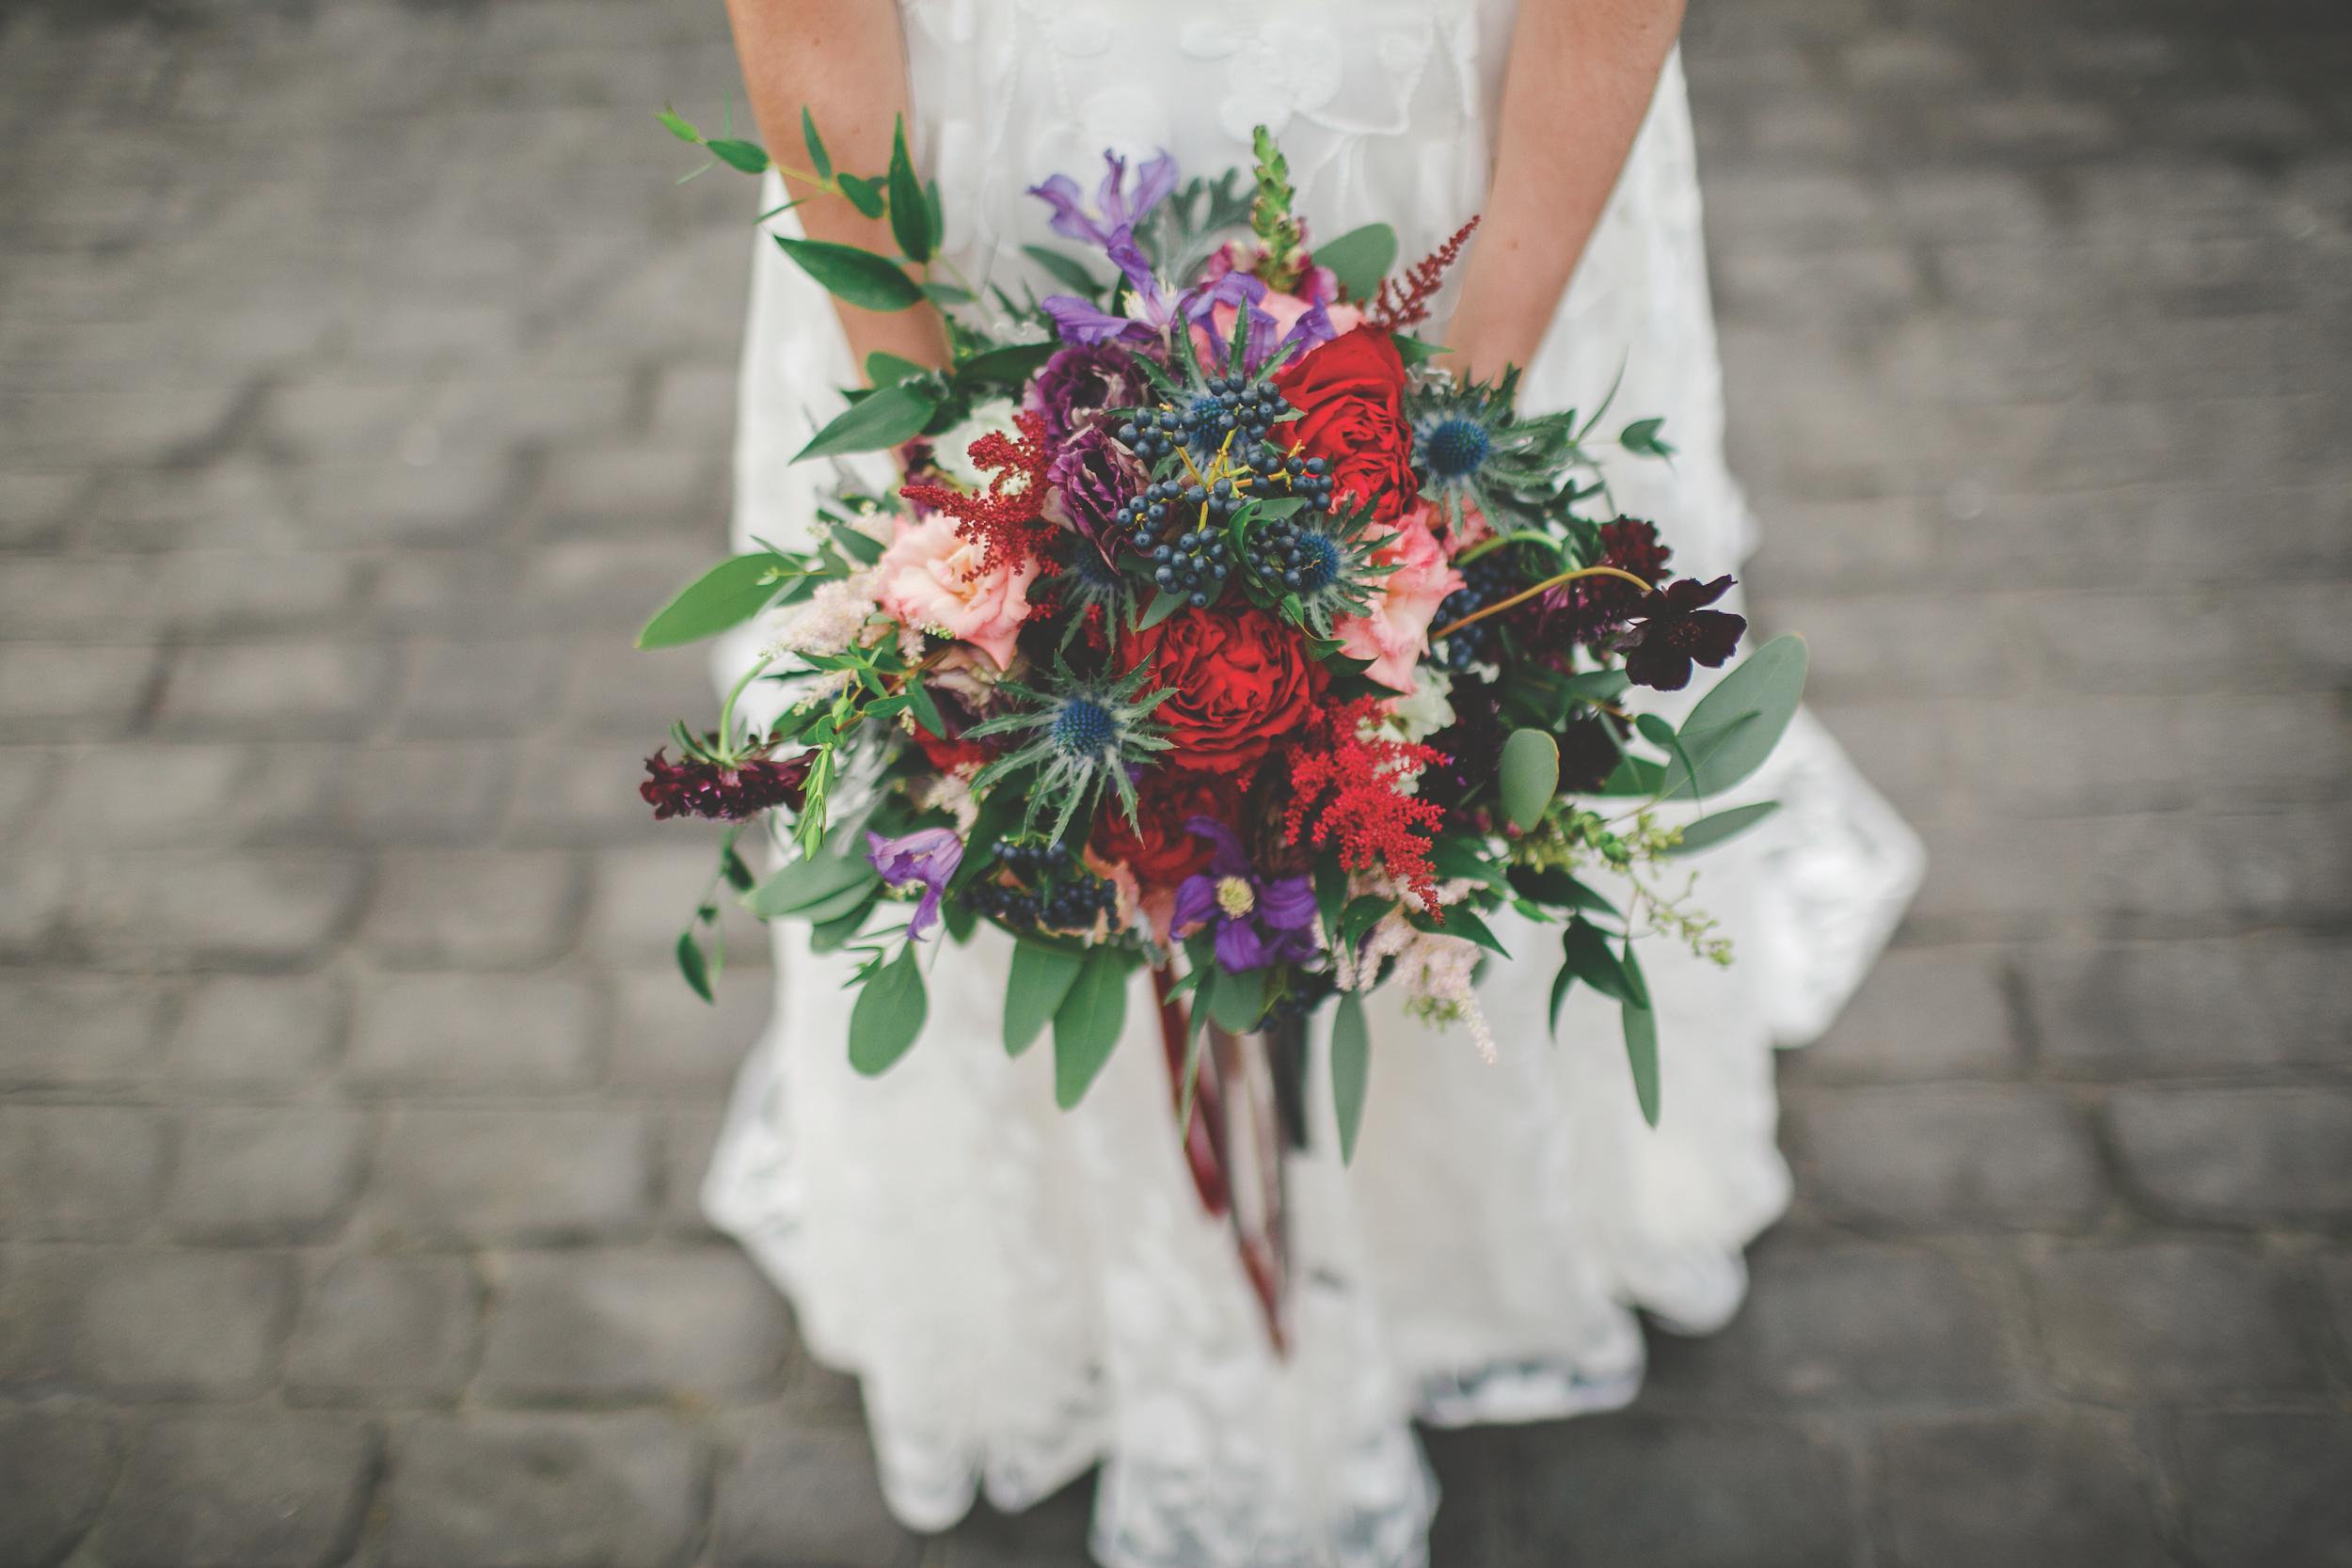 gather_and_tides_wedding_photographer_larchfield_autumn_northern_ireland_Wedding_inspire_Weddings_2.jpeg